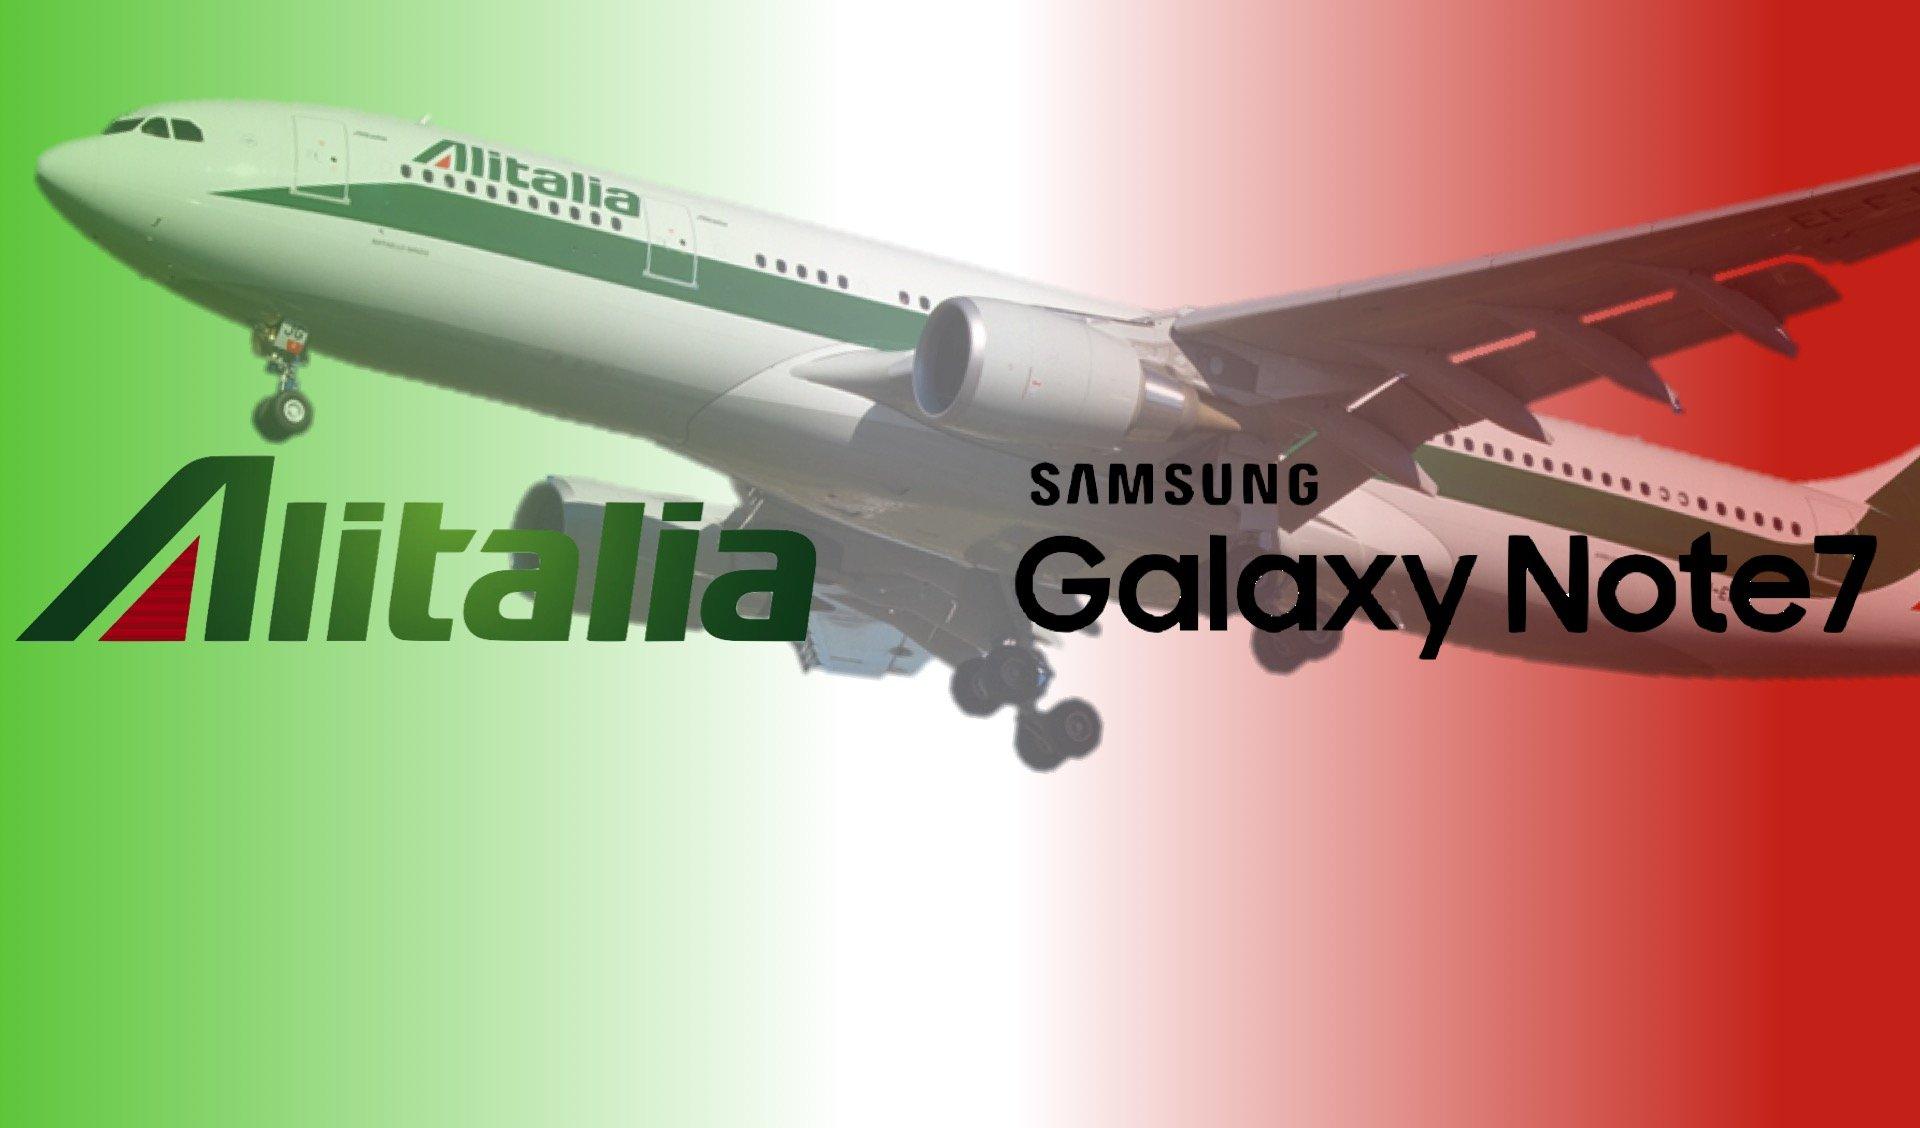 Alitalia vieta Note 7 aerei 2